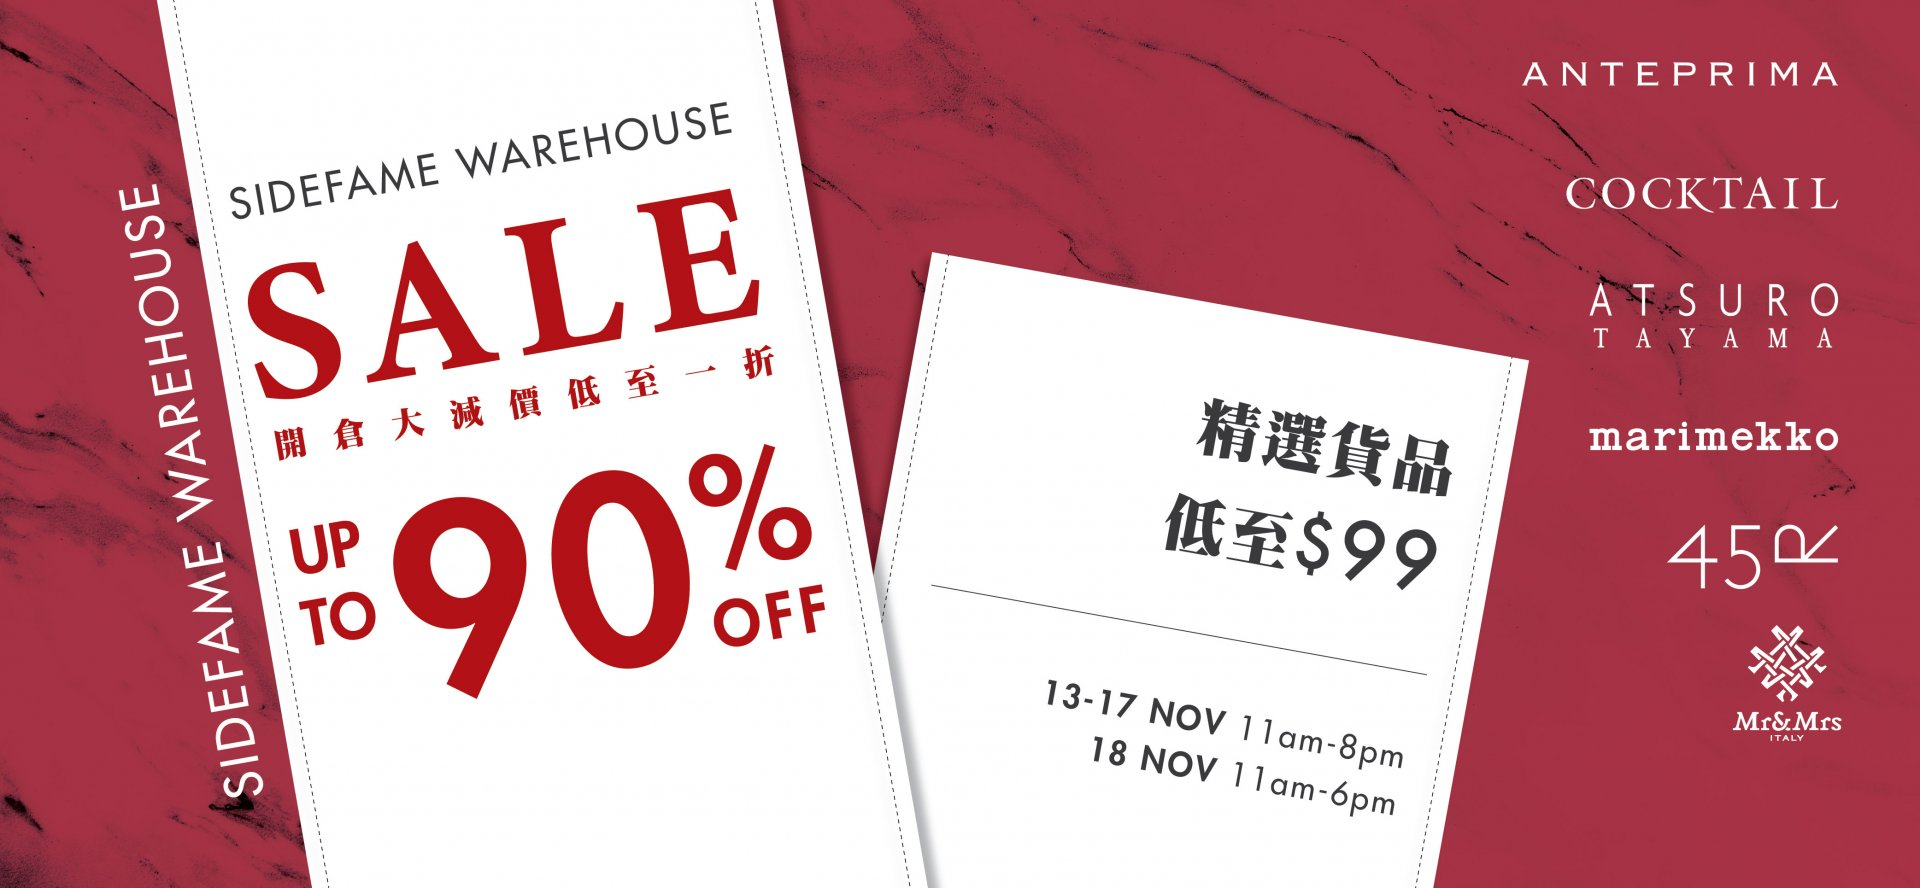 Sidefame Warehouse Sale